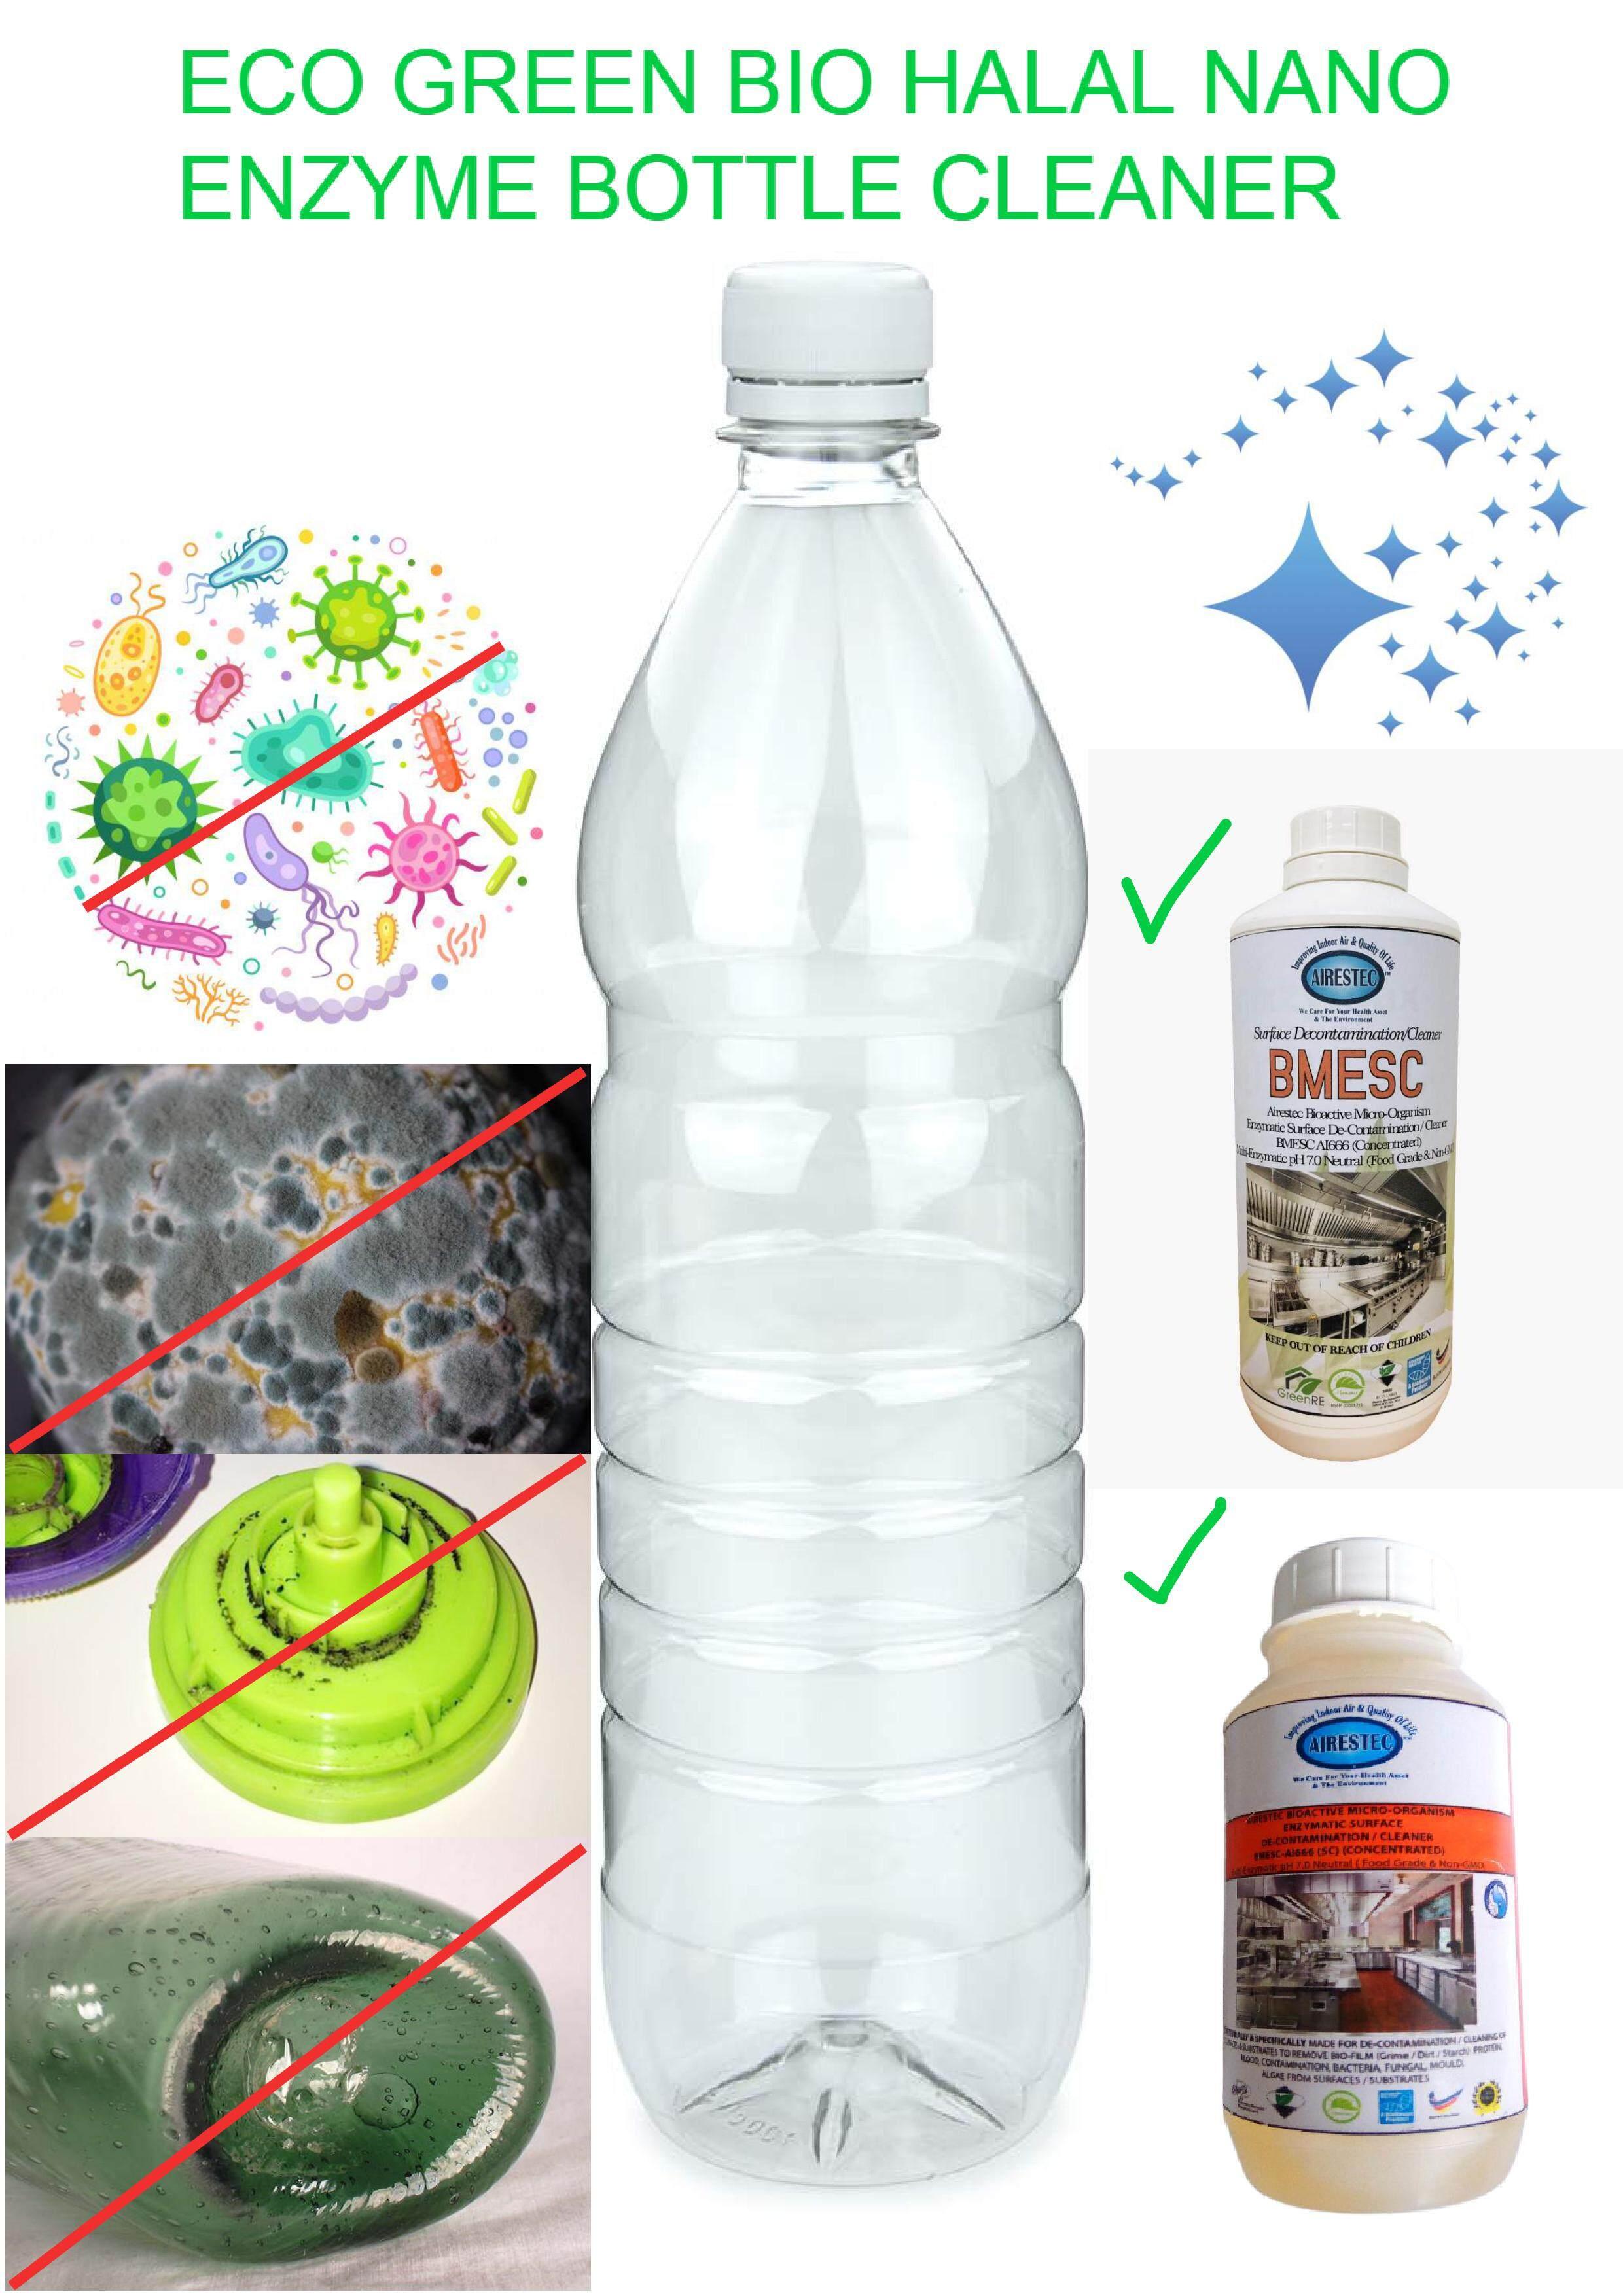 Eco Green Bio Halal Nano Enzyme Bottle Cleaner / Wash - Mini (250 ml) #Airestec #bioenzymes #bio #eco-label #green #ecofriendly #eco #halal #non-corrosive #neutral #foodgrade #child-friendly #pet-friendly #biodegradable #safe